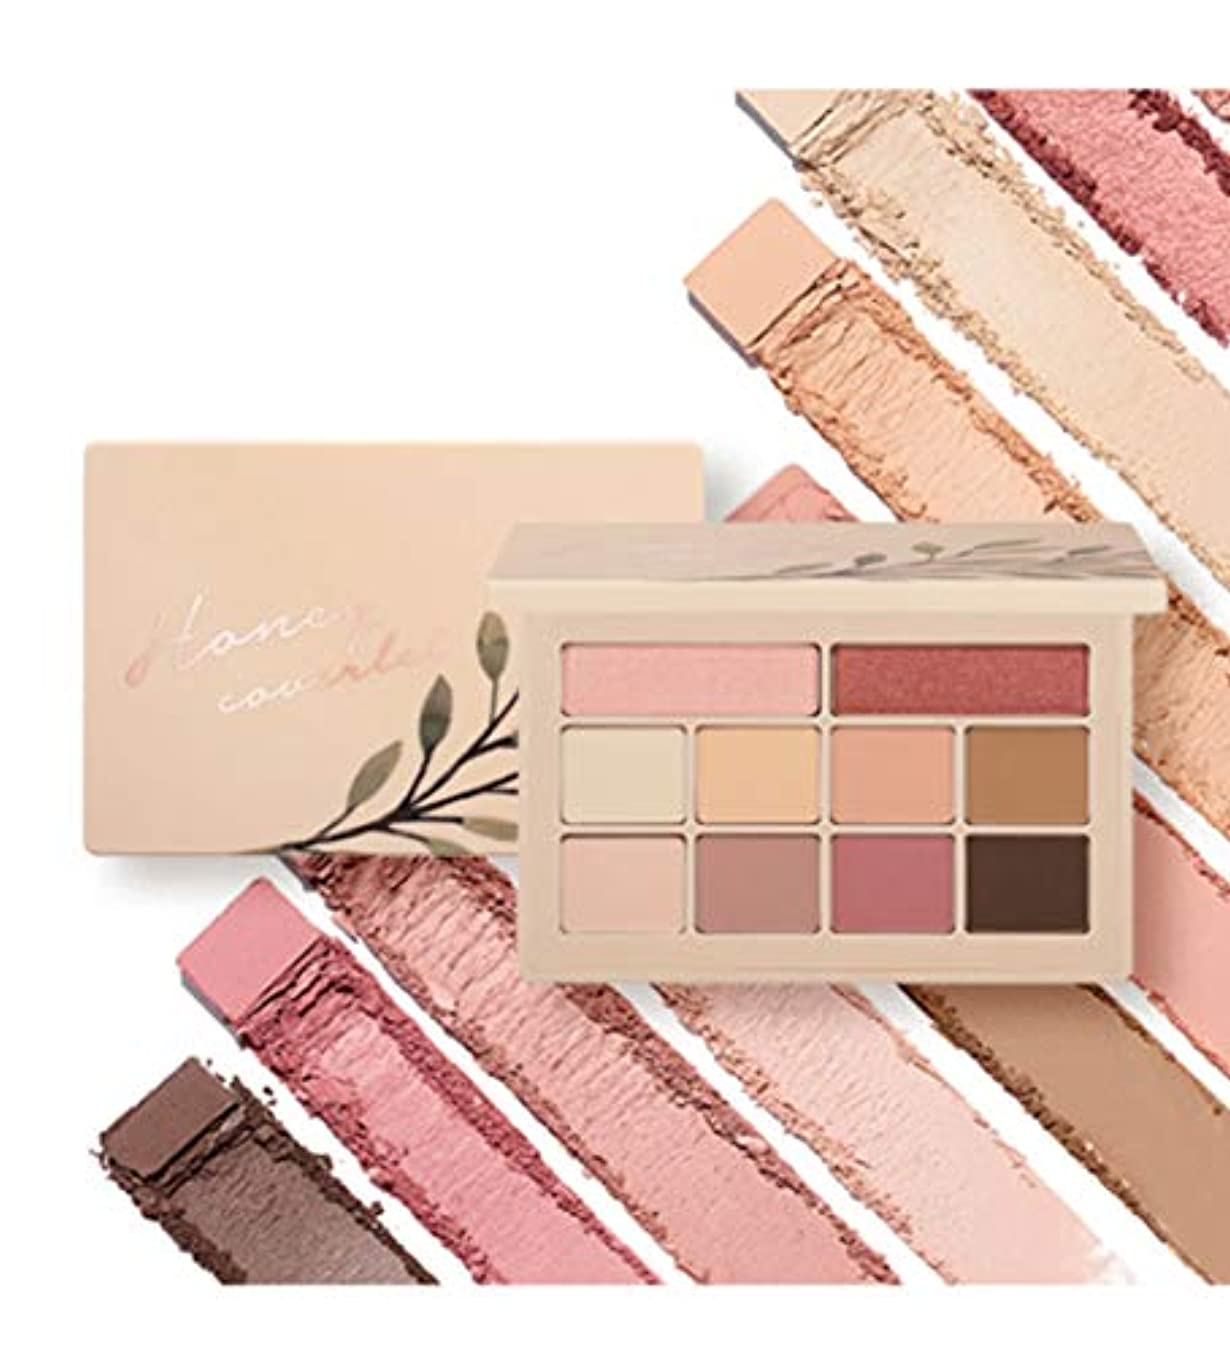 Moonshot Honey Coverlet Eyeshadow Palette YOO IN-NA COLLECTIONwarm tone&cool tone 10色のアイシャドウ(並行輸入品)